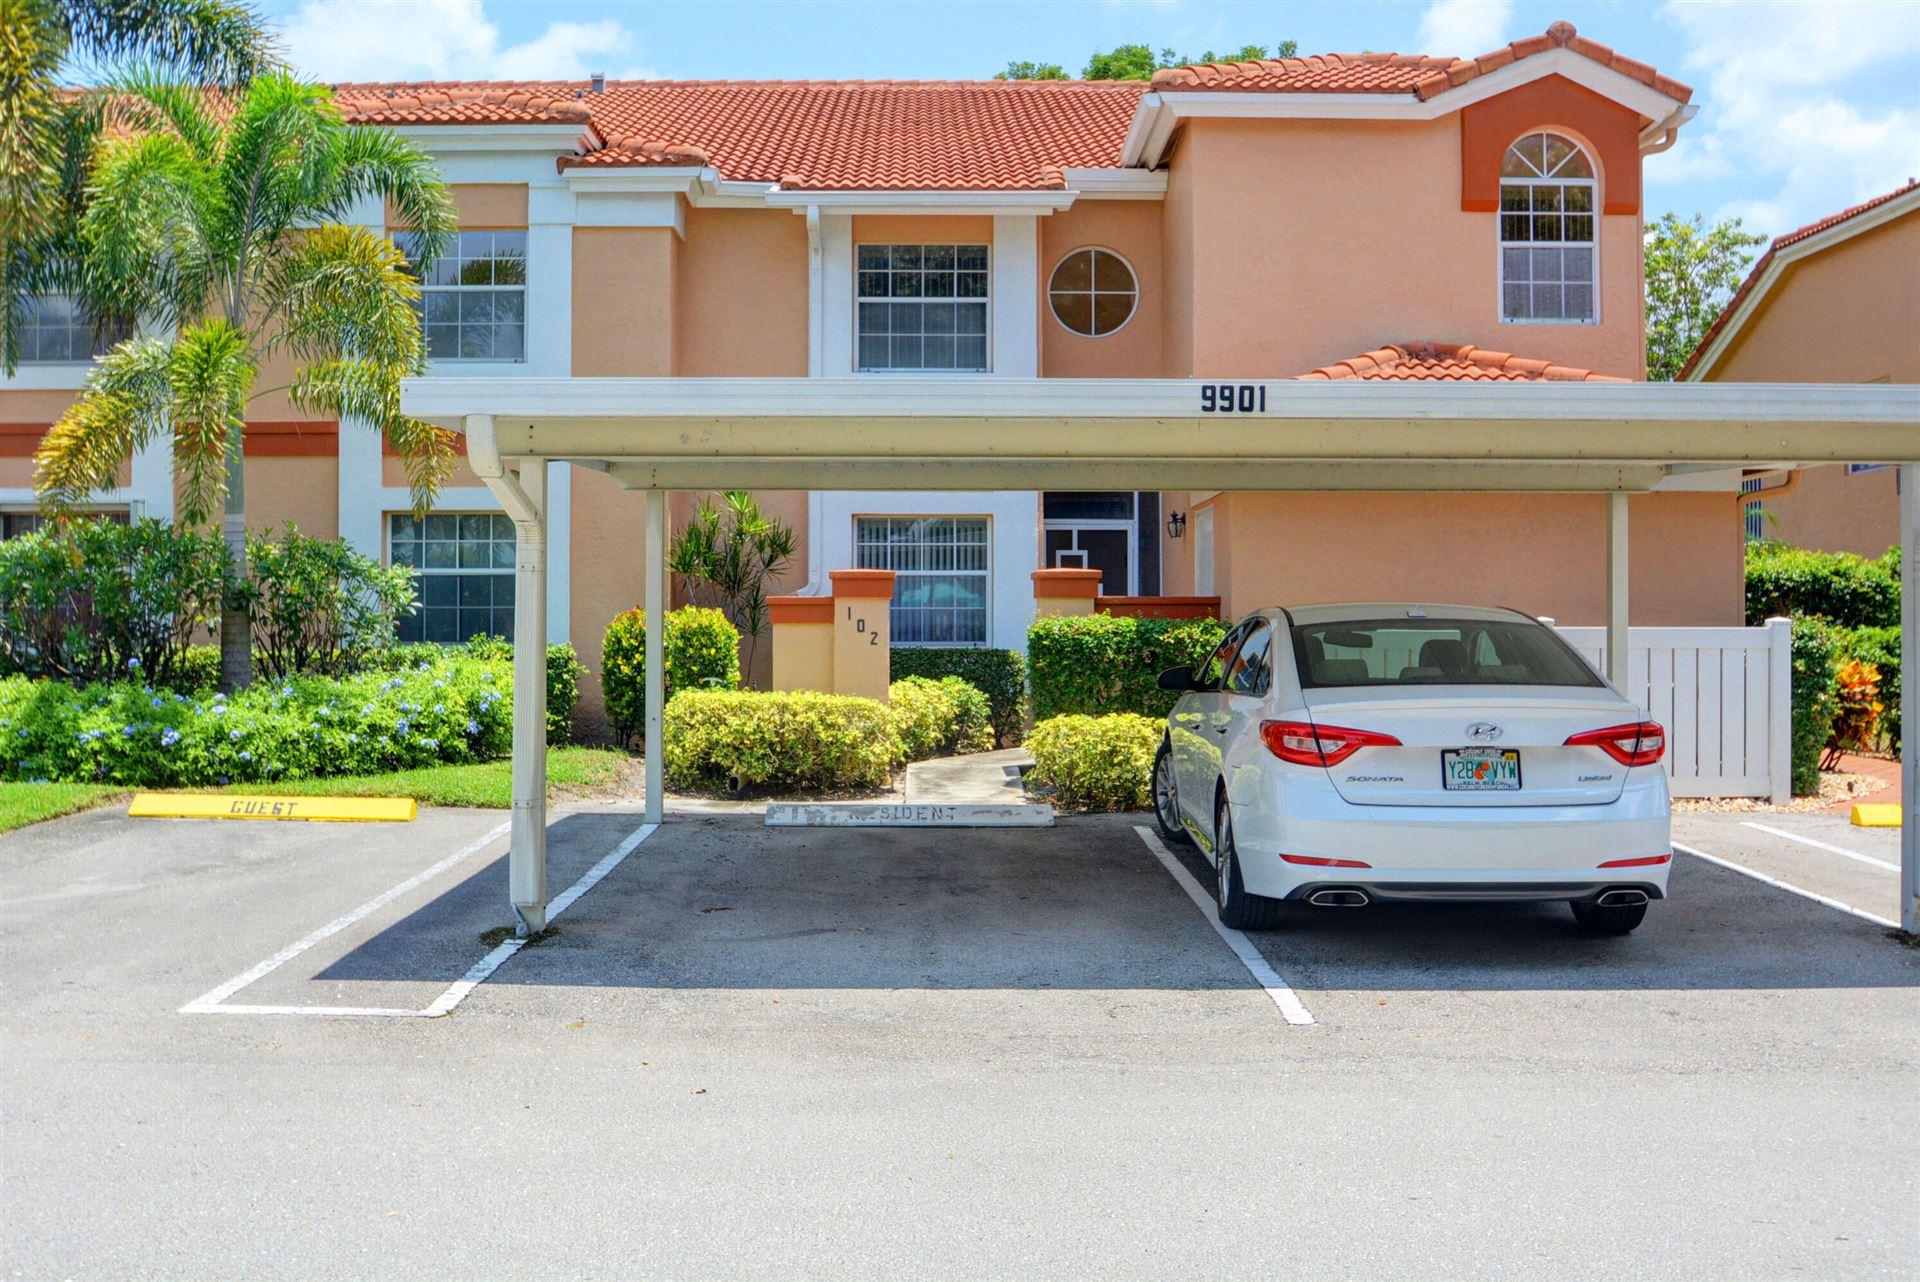 9901 Seacrest Circle #102, Boynton Beach, FL 33437 - MLS#: RX-10733666